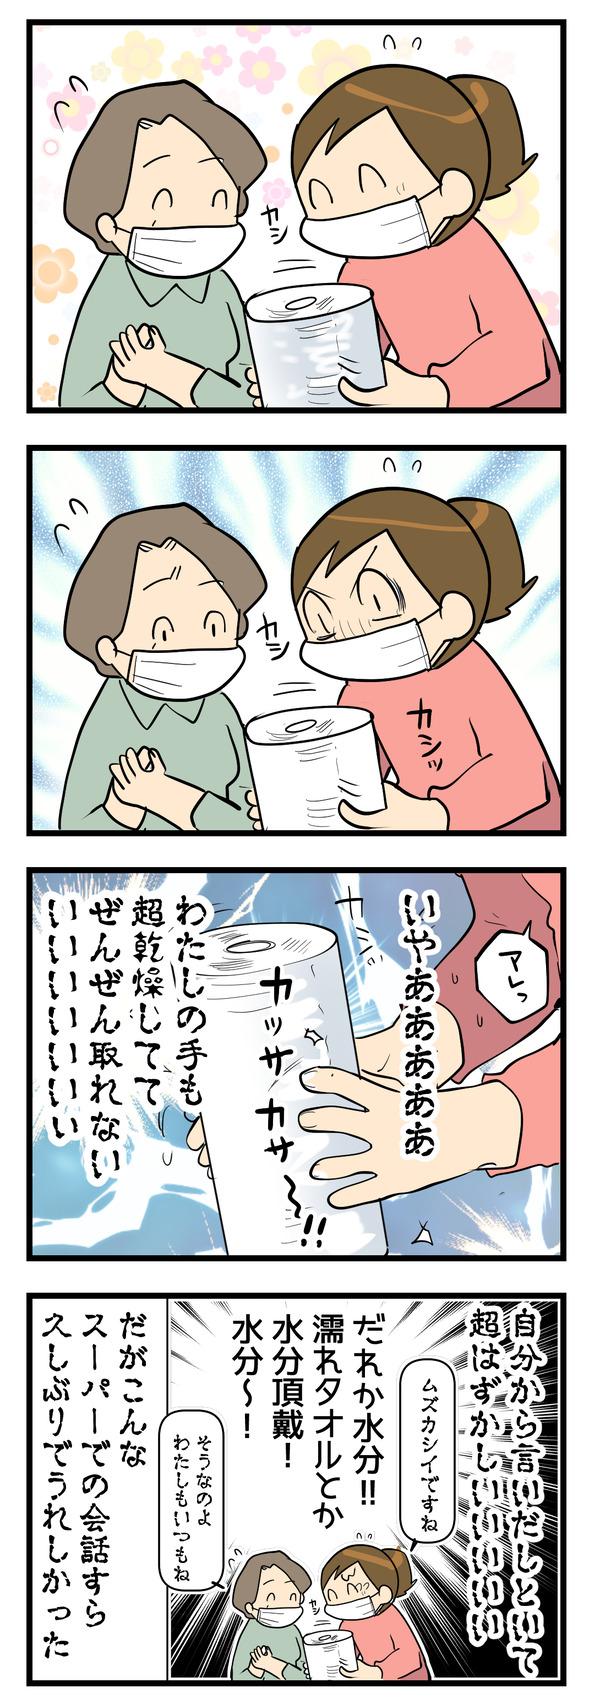 hazukasii2